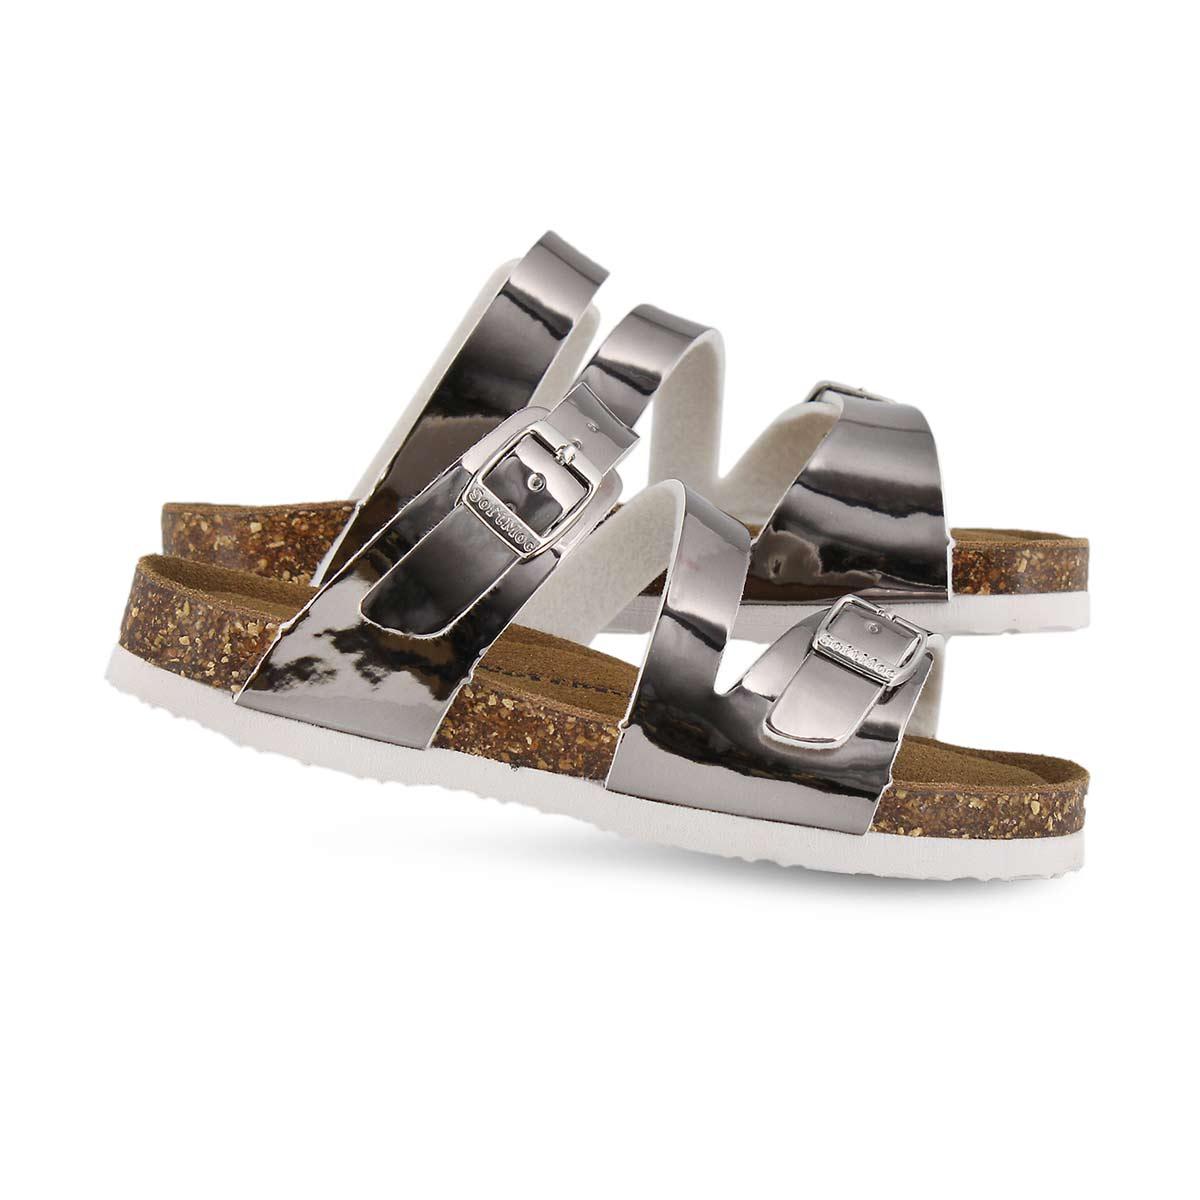 Grls Avalon 6 slv pat memory foam sandal